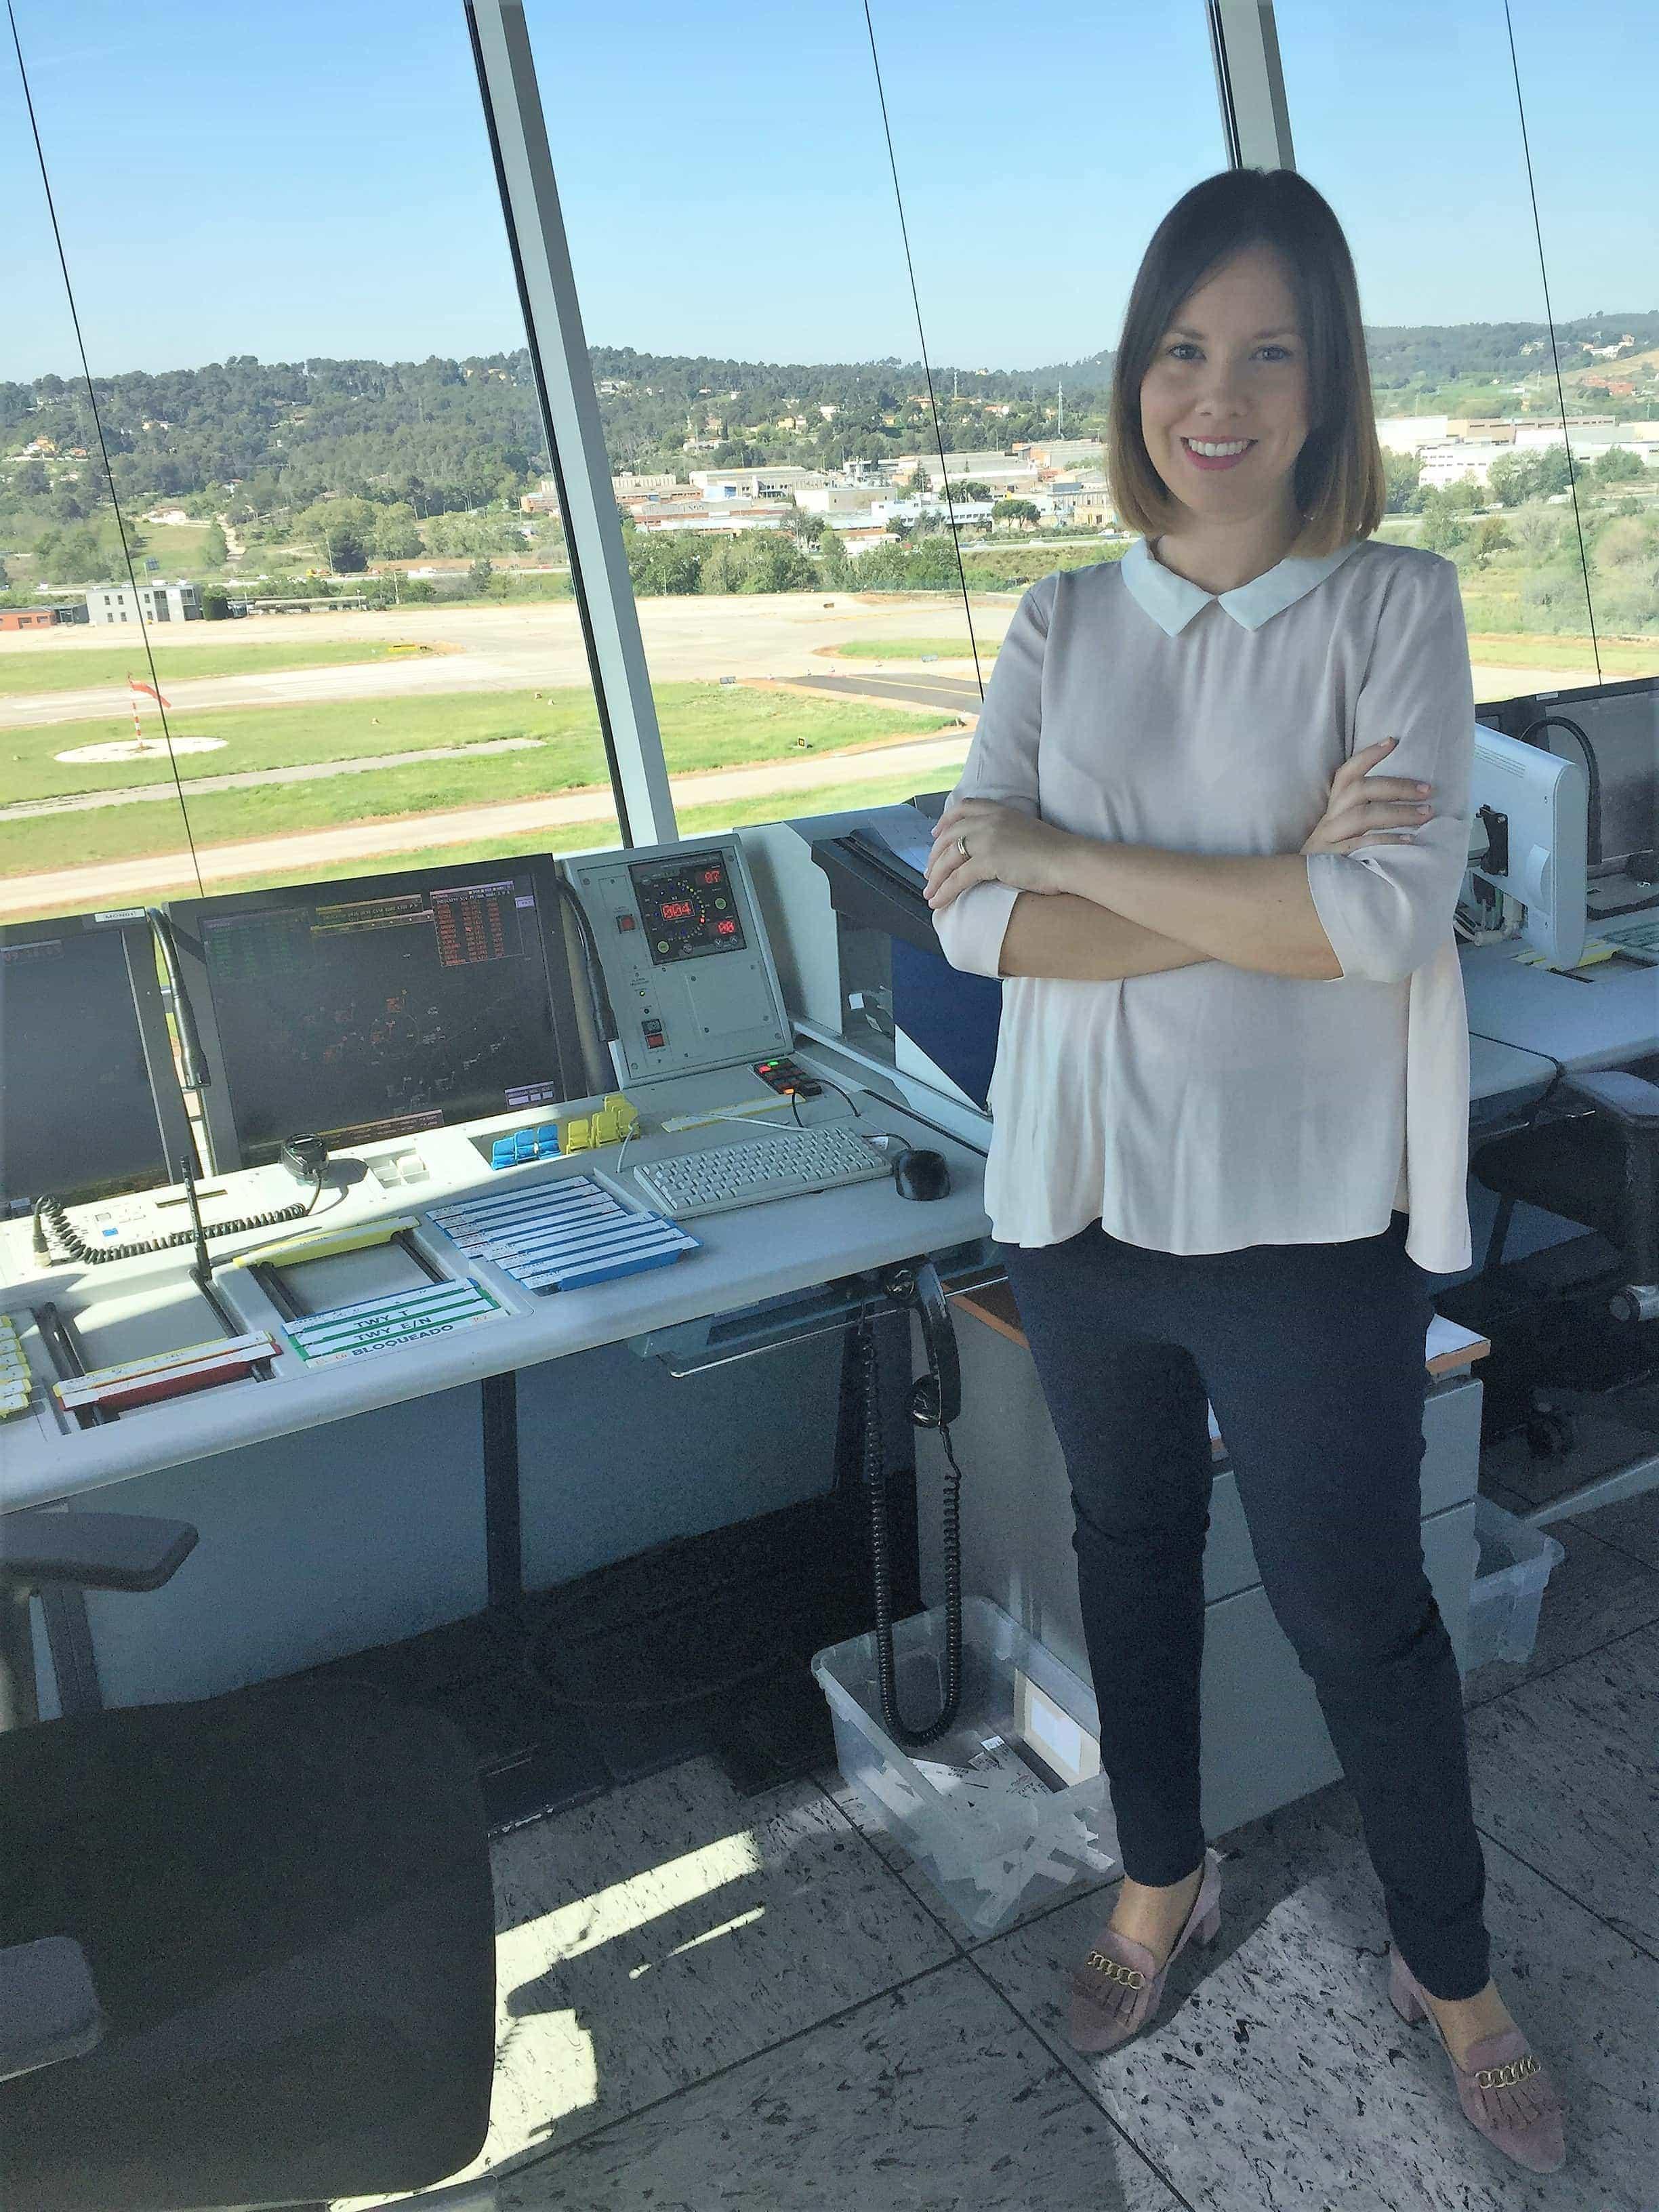 air traffic controller ferronats barcelona